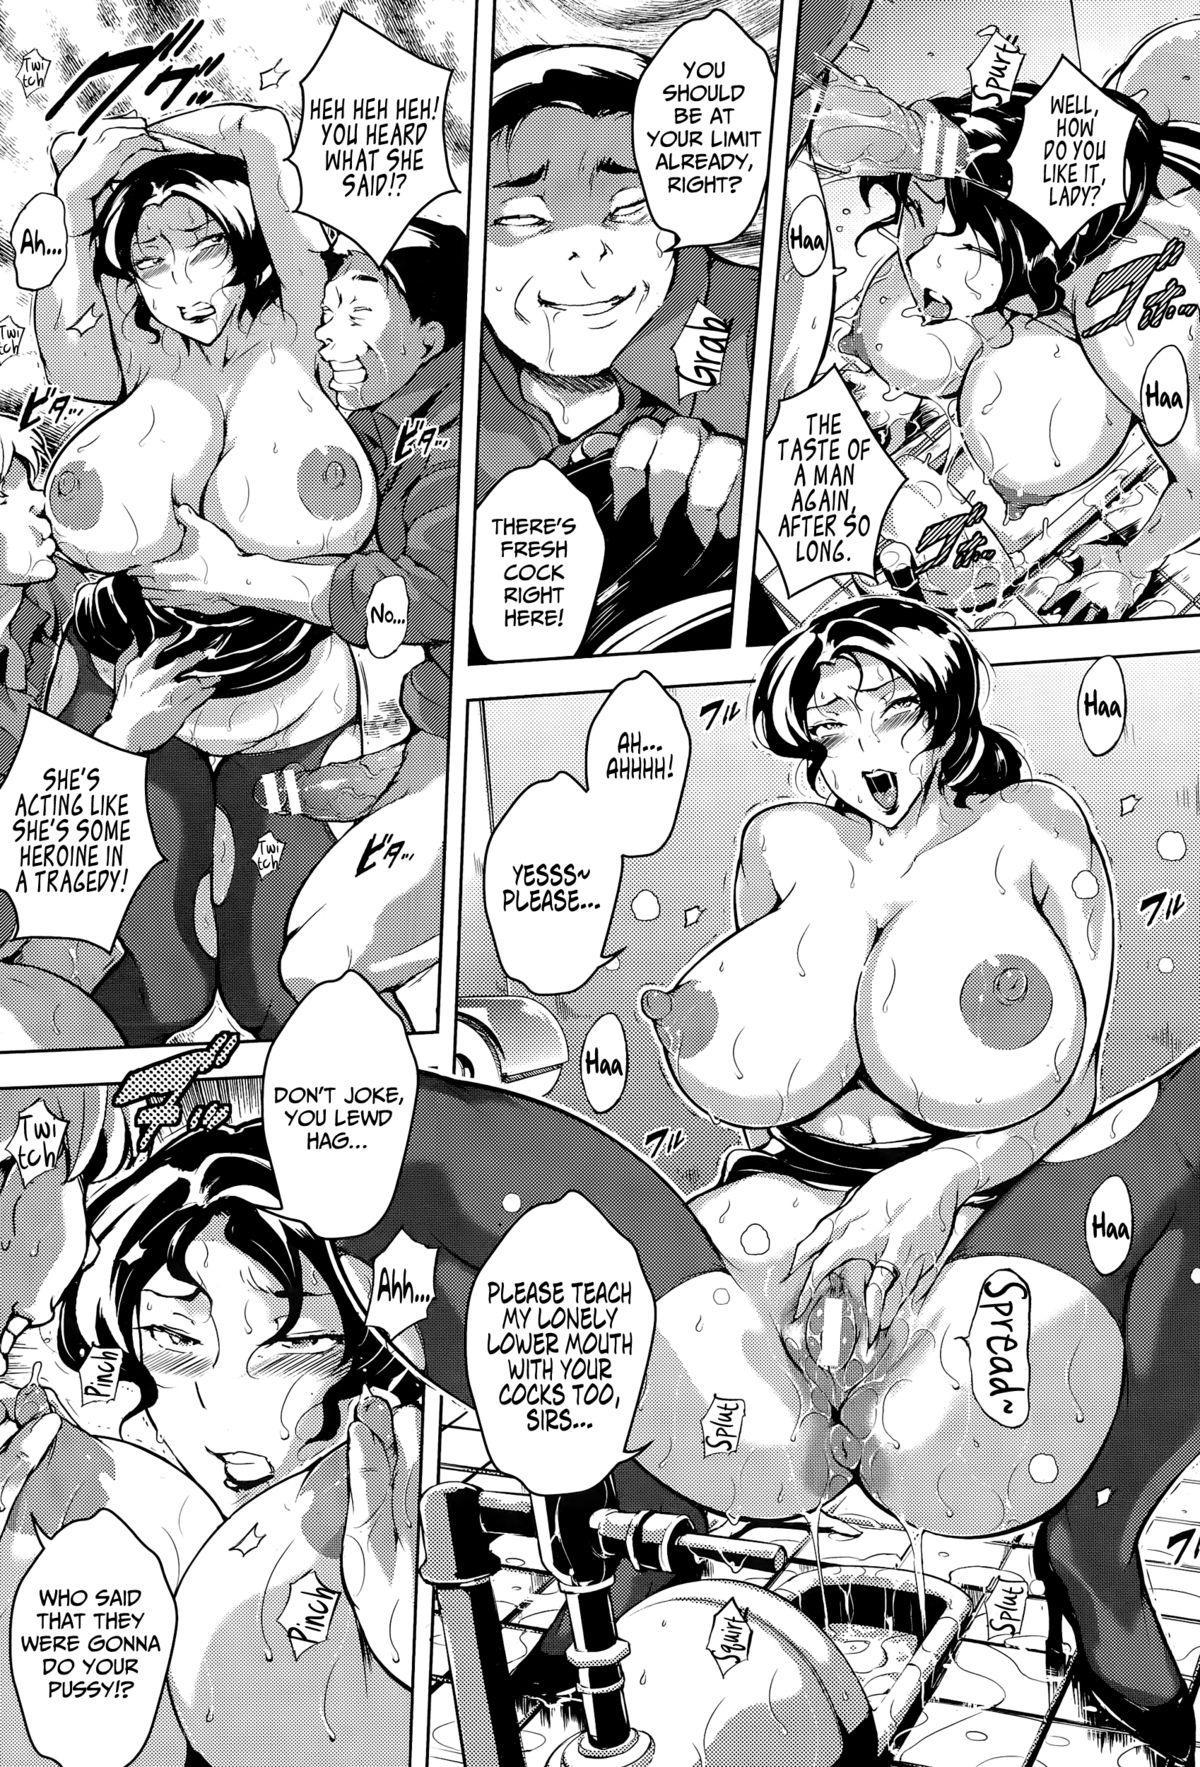 Ryoujyoku Chikan Kyuukou | Rapist Molester Express 12